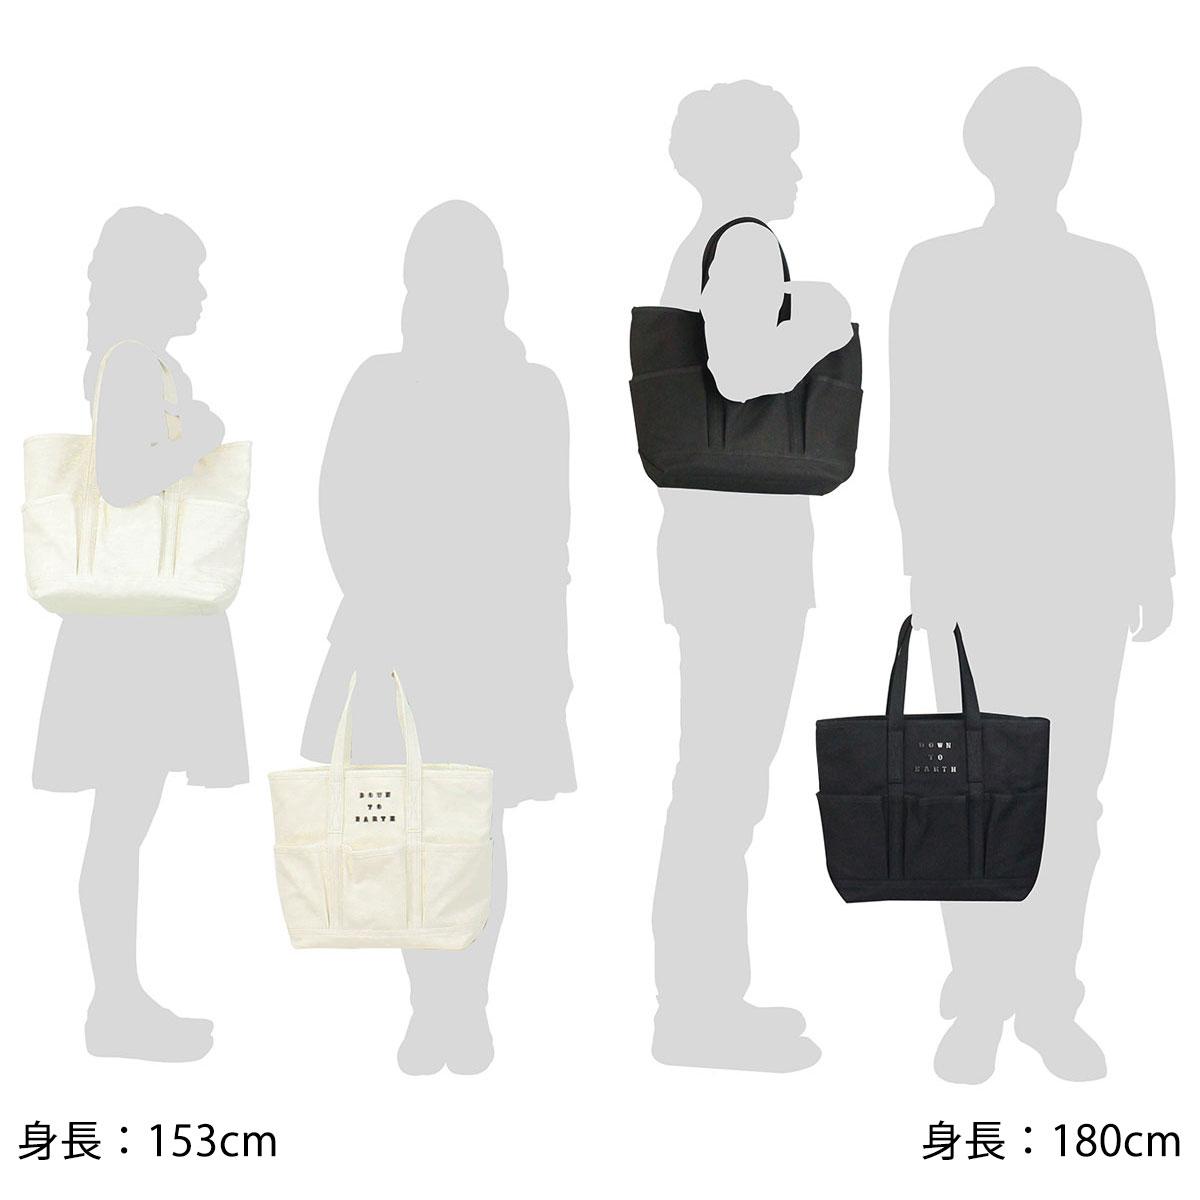 KICHIZO by Porter Classic キチゾー by ポータークラシック トートバッグ 012-00095G